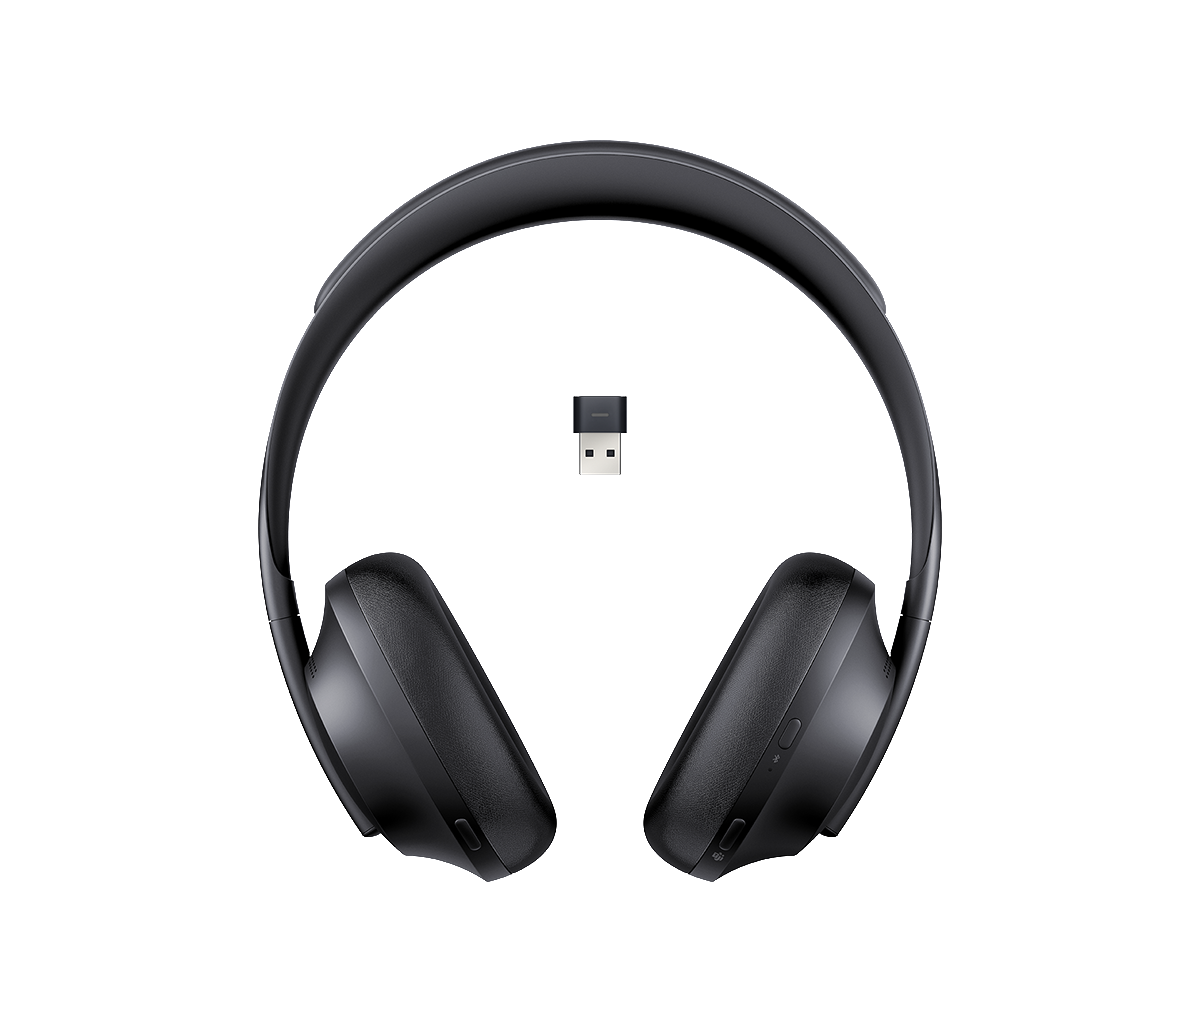 Bose Noise Cancelling Headphones 700 UC Black 852267-0100